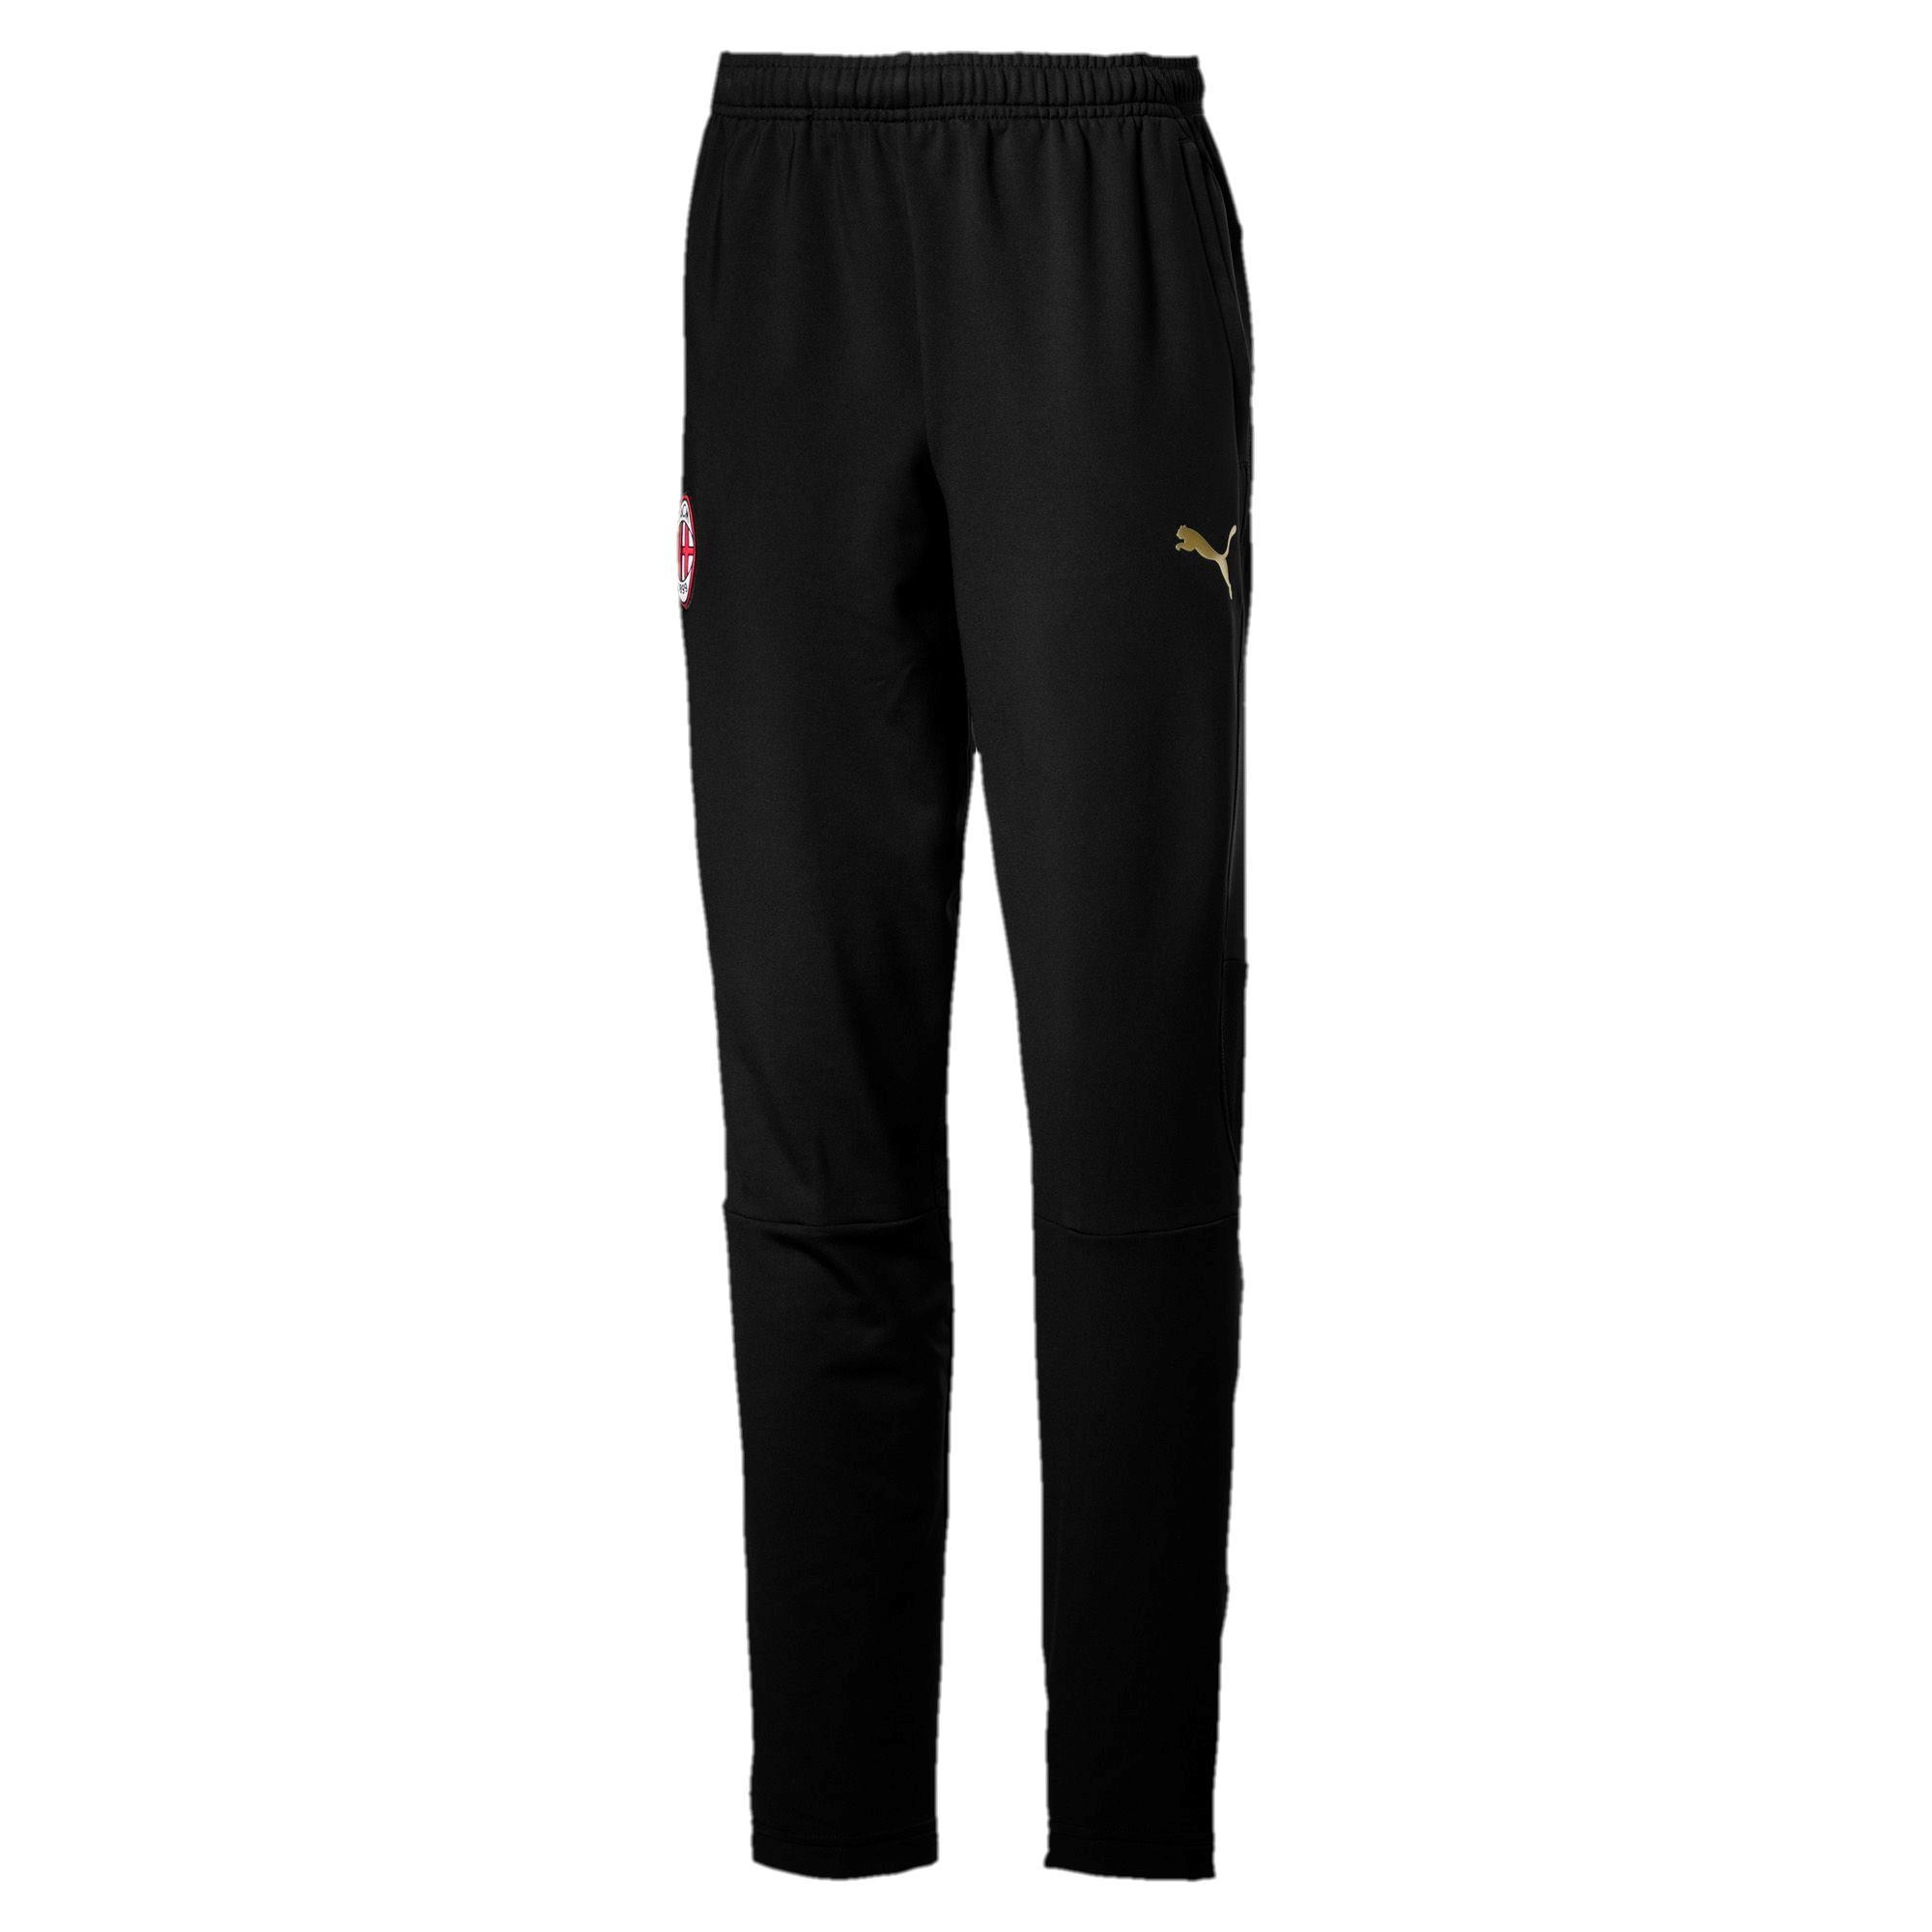 Puma Pantalone Allenamento Milan Junior